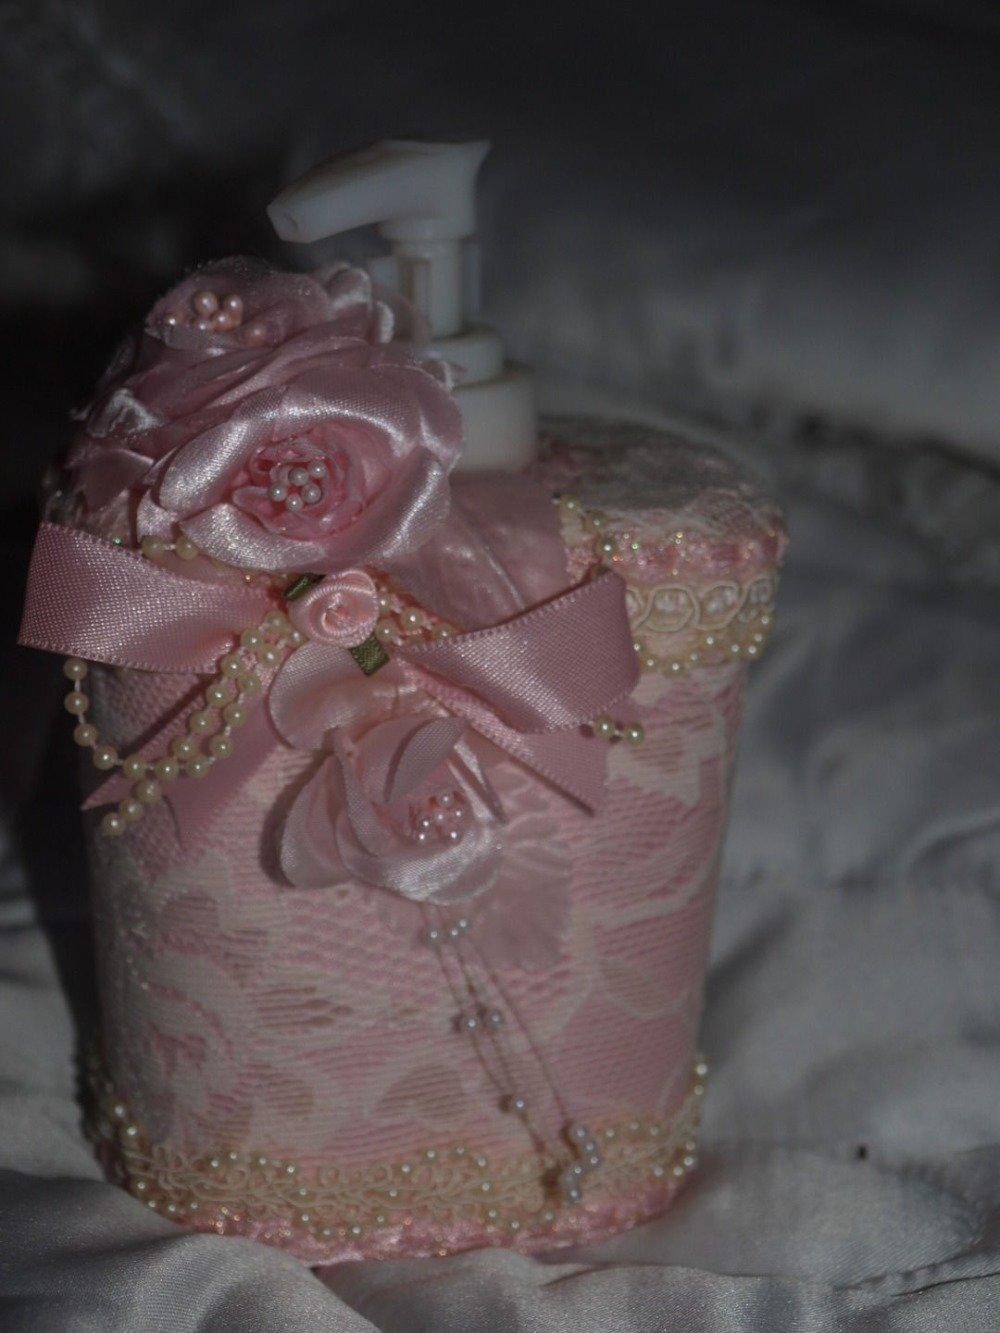 PORTE SAVON DECORATIF SHABBY CHIC EN DENTELLE ROSE ET PERLES ET FLEURS